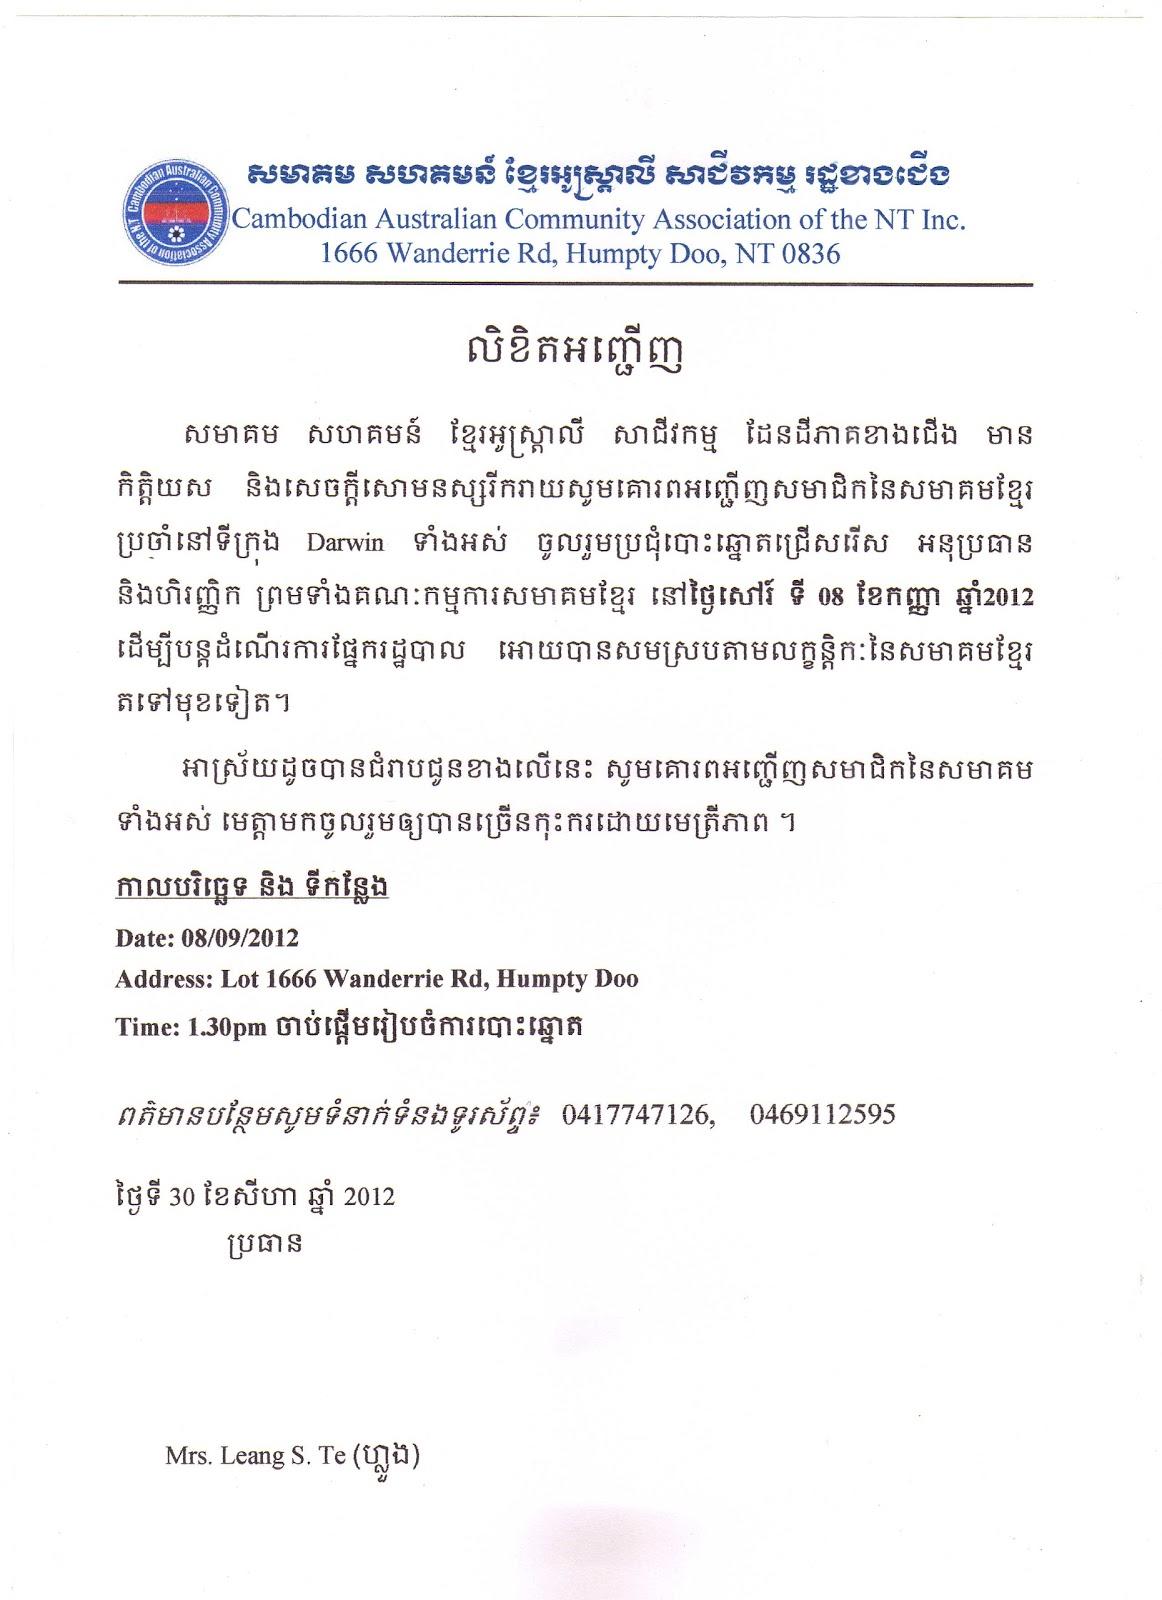 khmer darwin invitation letter invitation letter posted by khmer cambodia stopboris Images